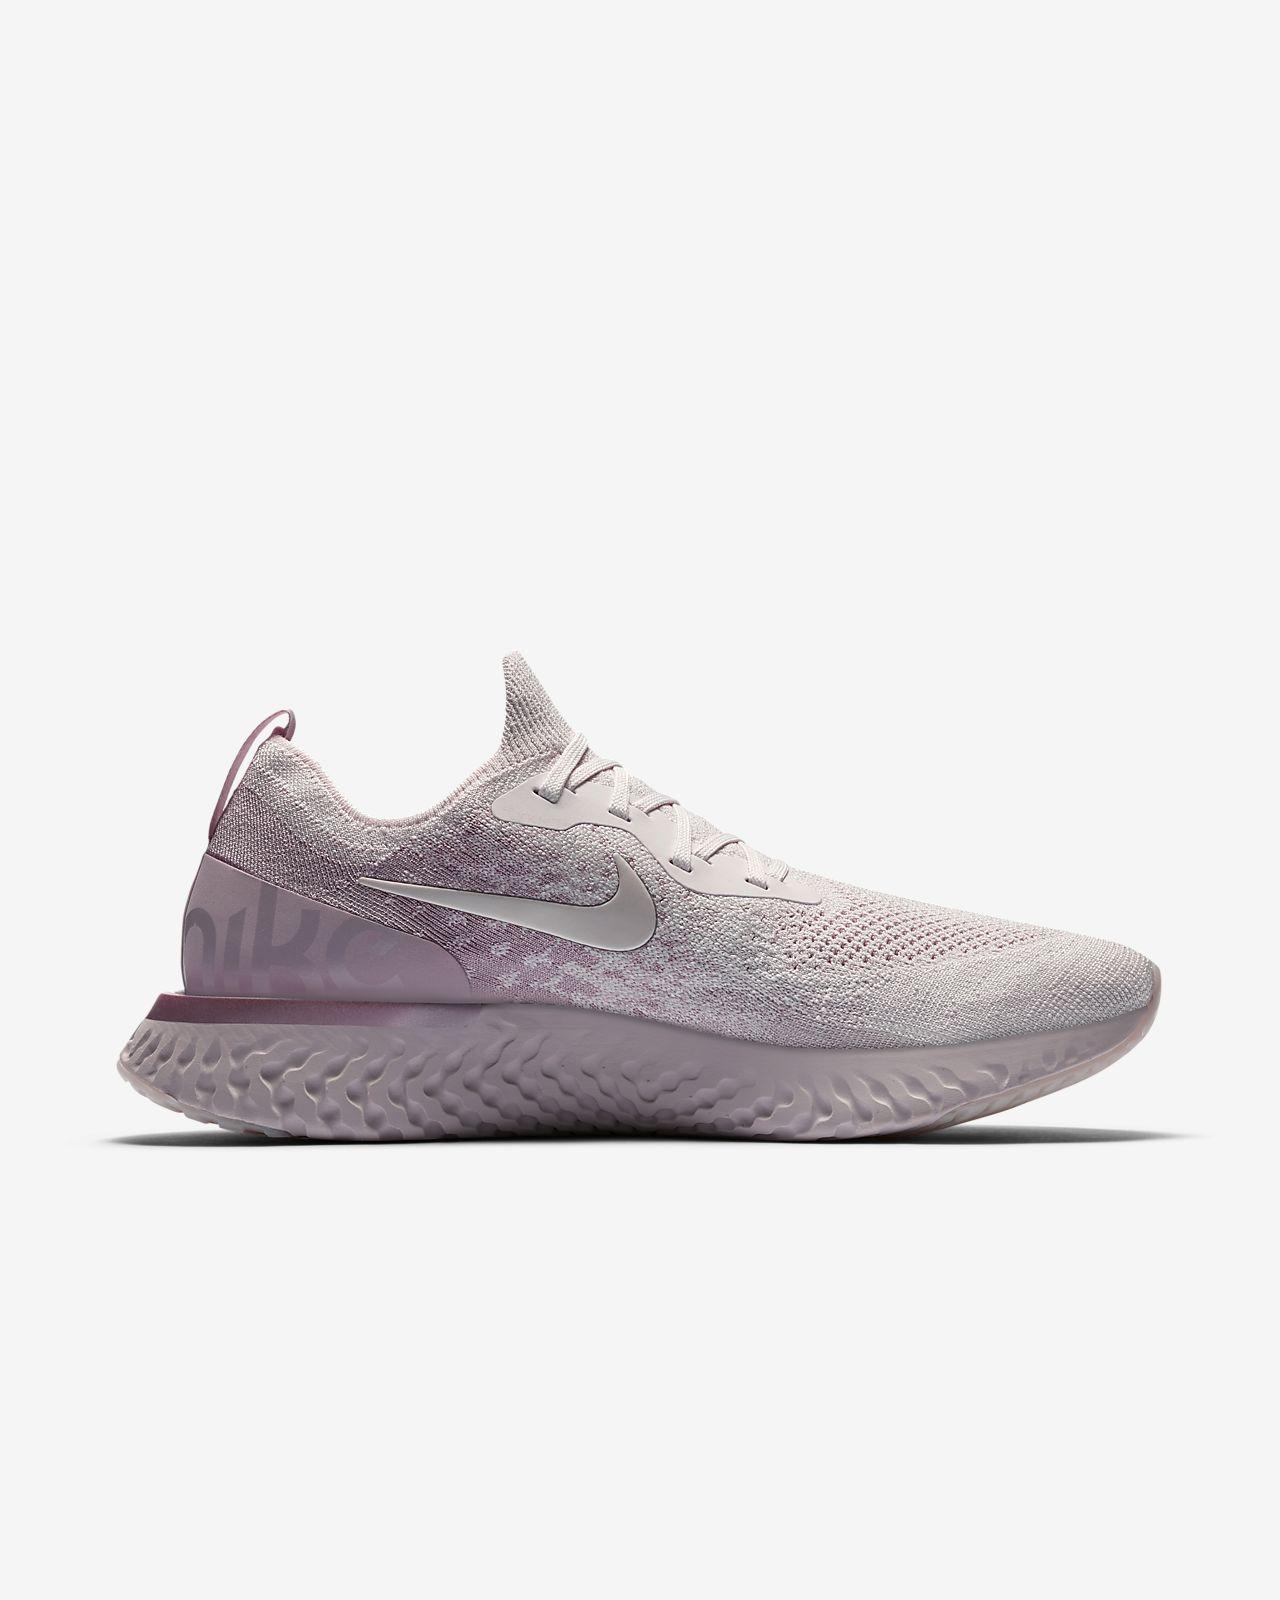 ... Nike Epic React Flyknit Men's Running Shoe